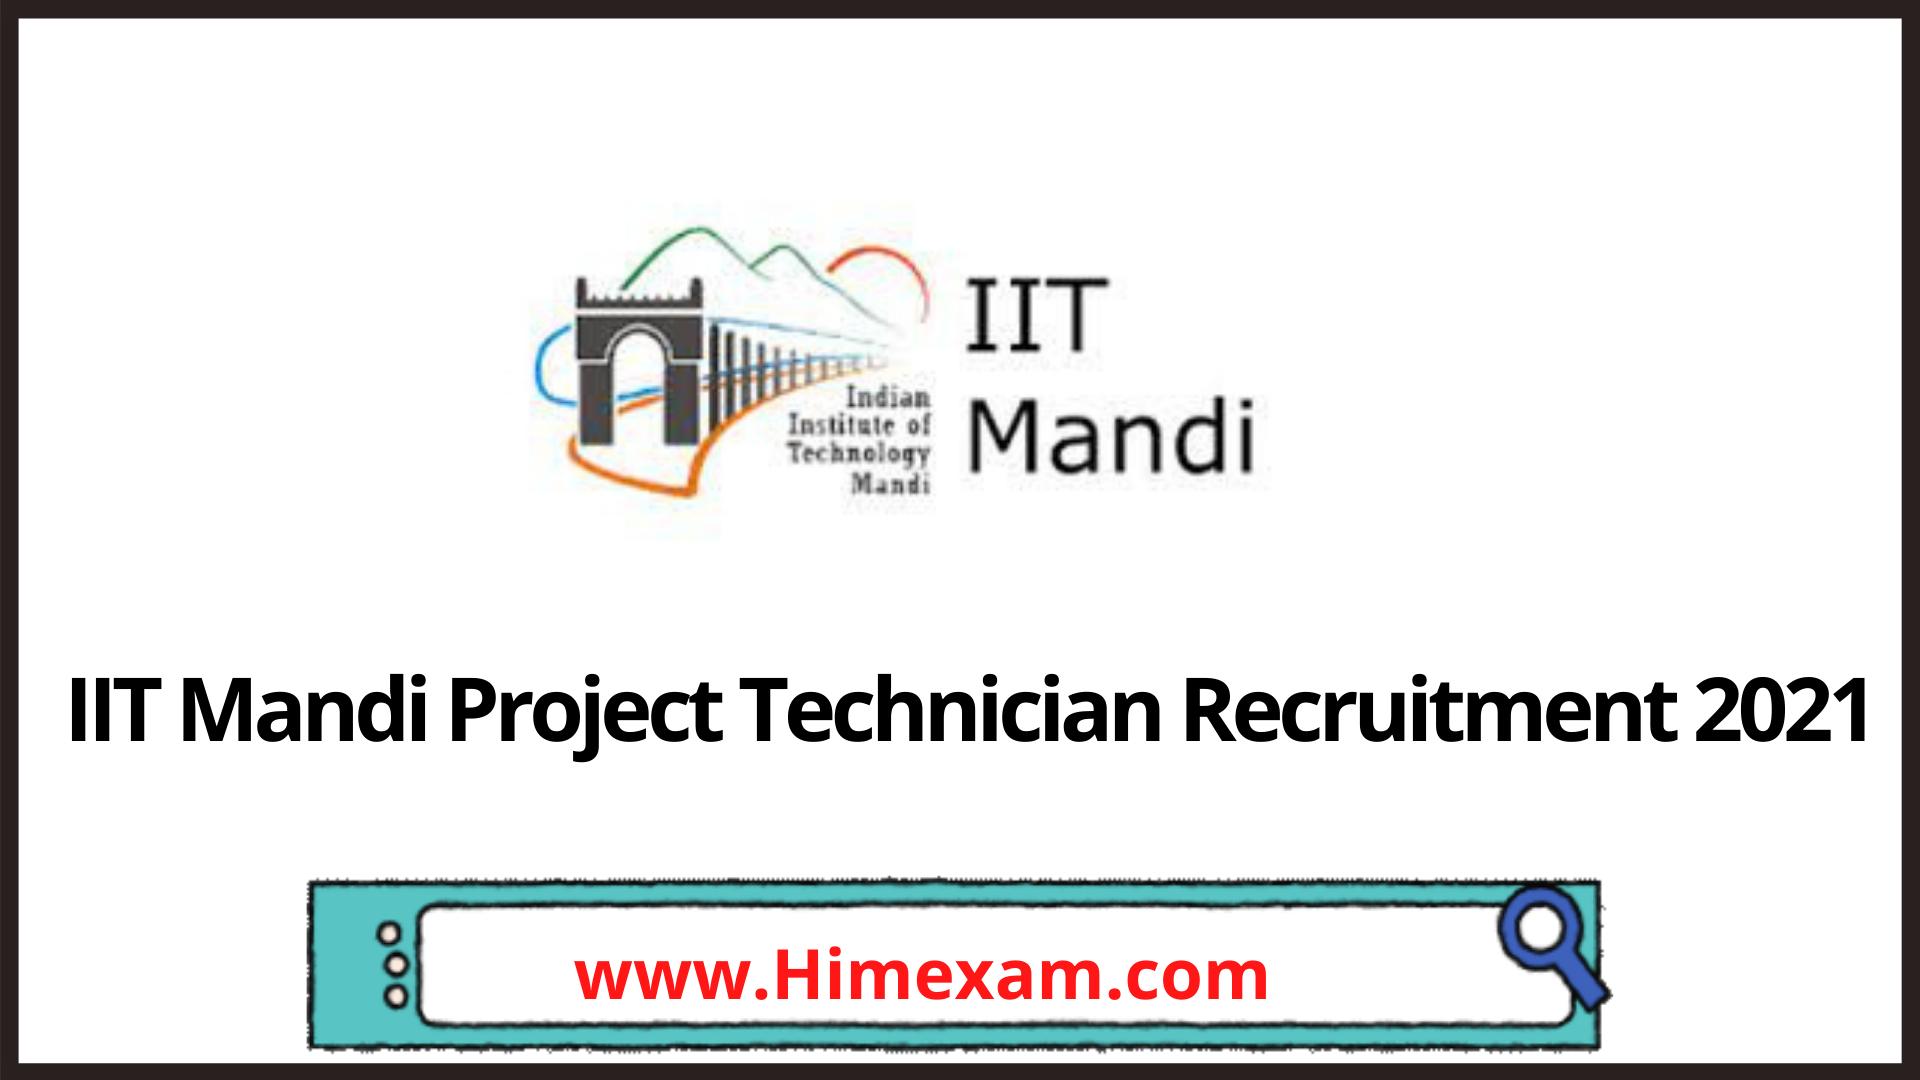 IIT Mandi Project Technician Recruitment 2021